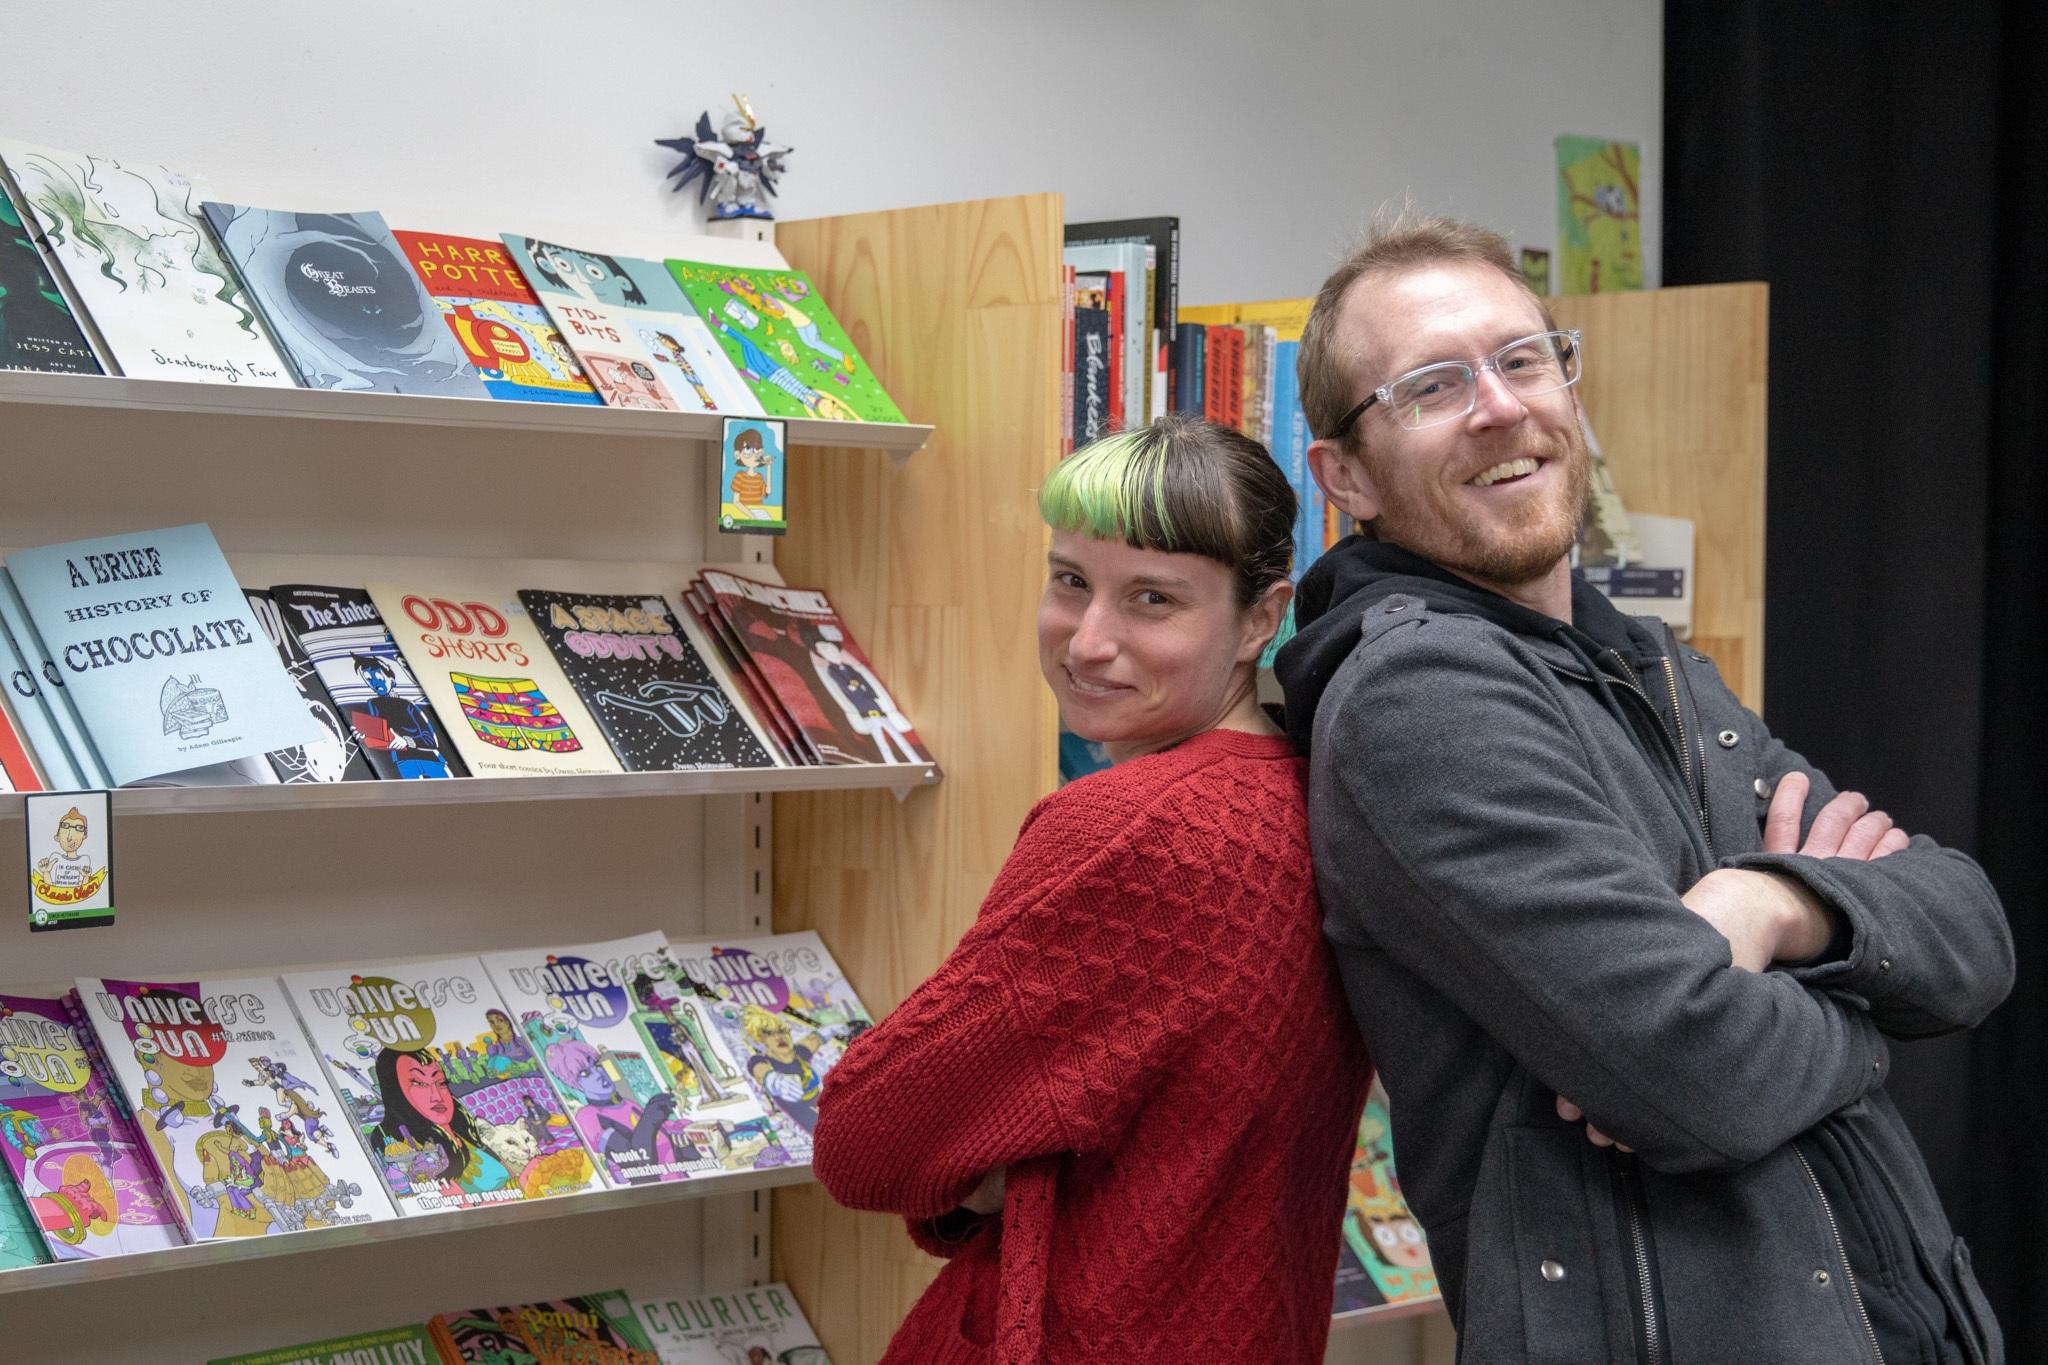 Georgina chadderton and owen heitmann